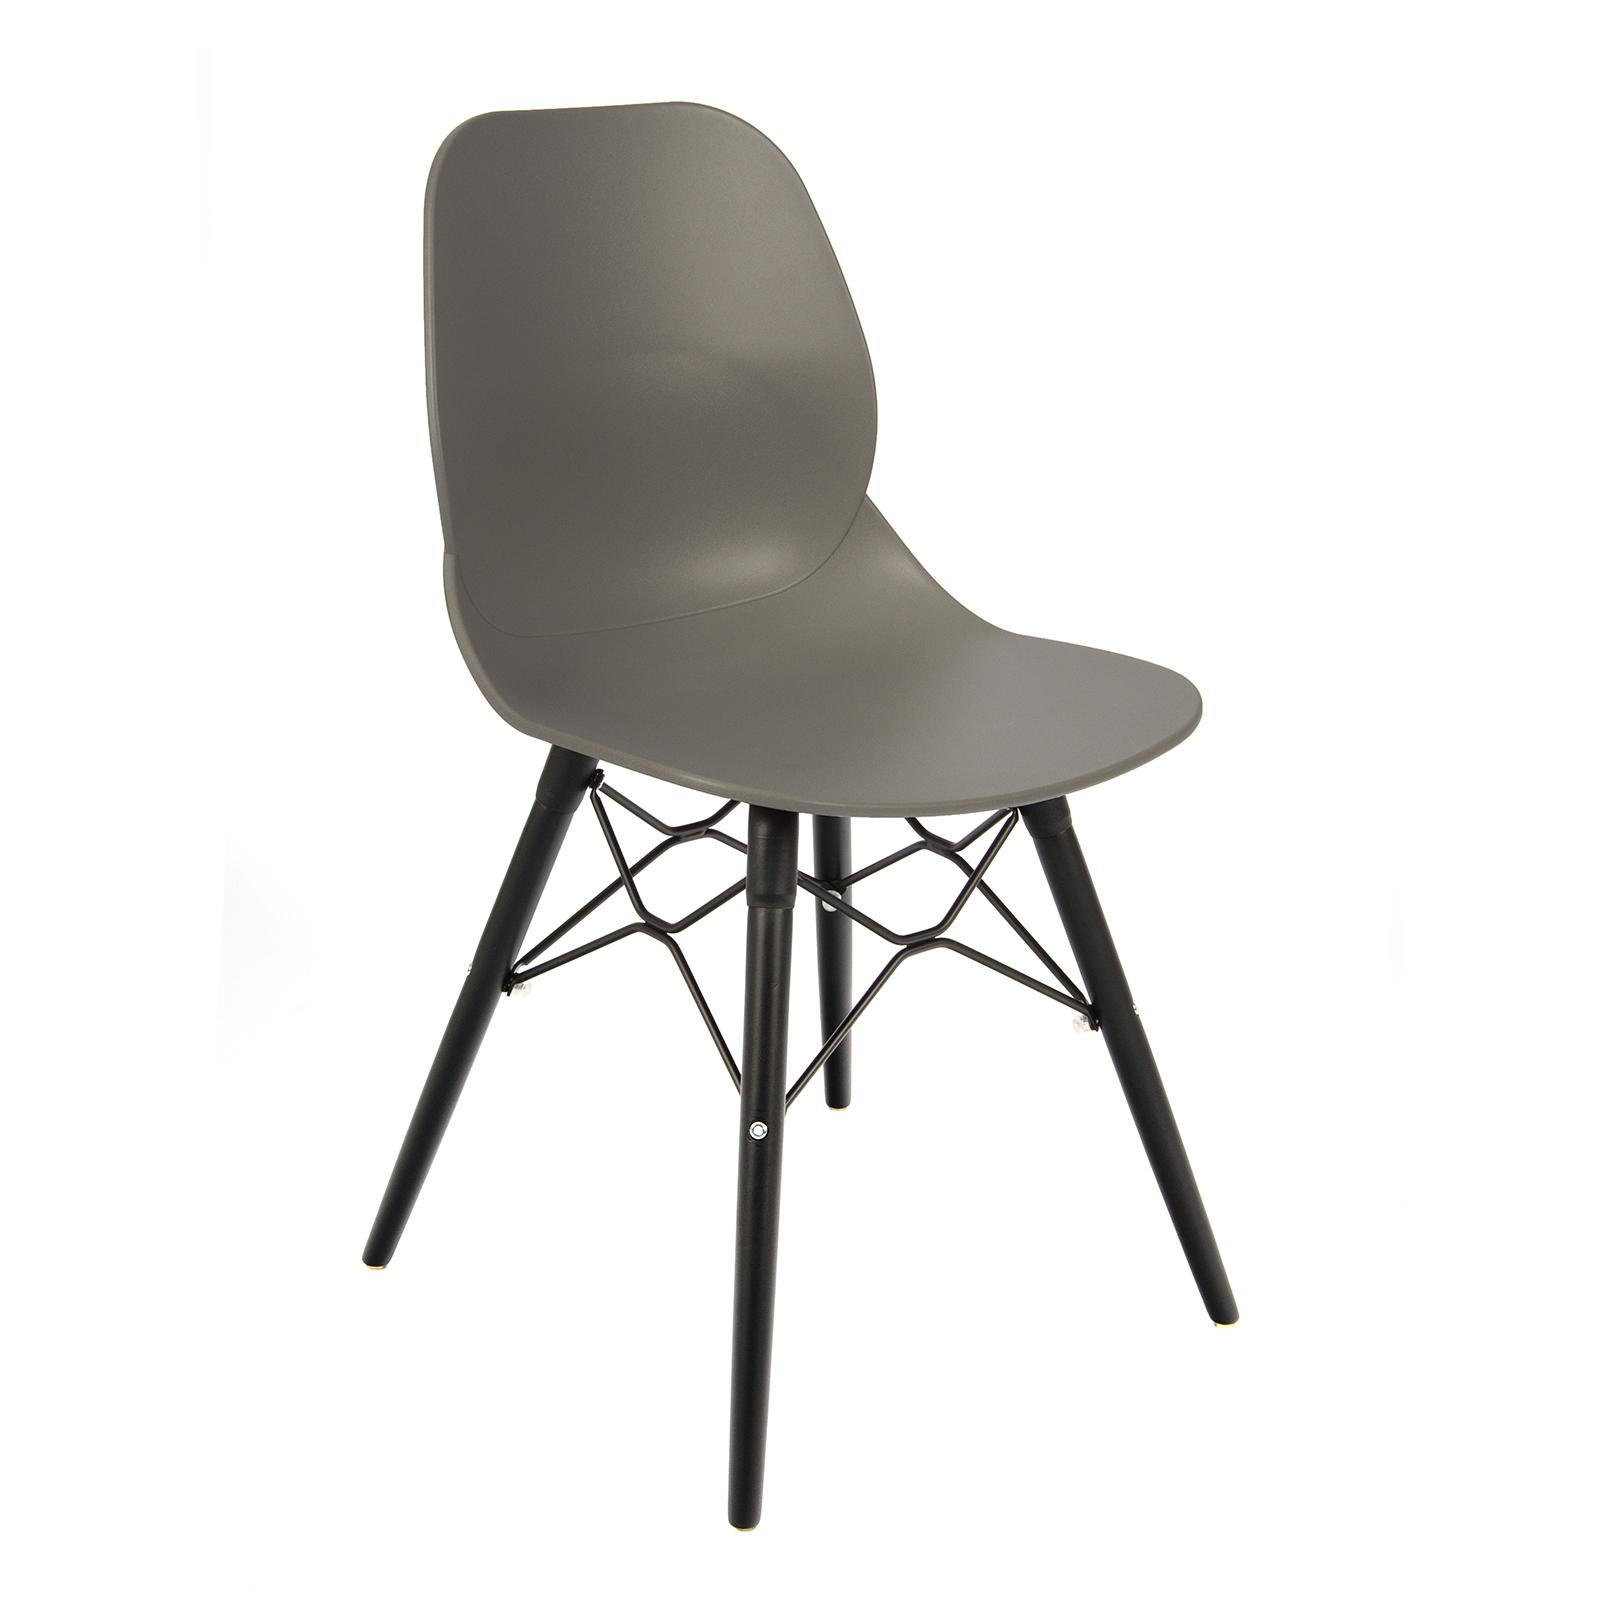 Strut multi-purpose chair with black steel frame